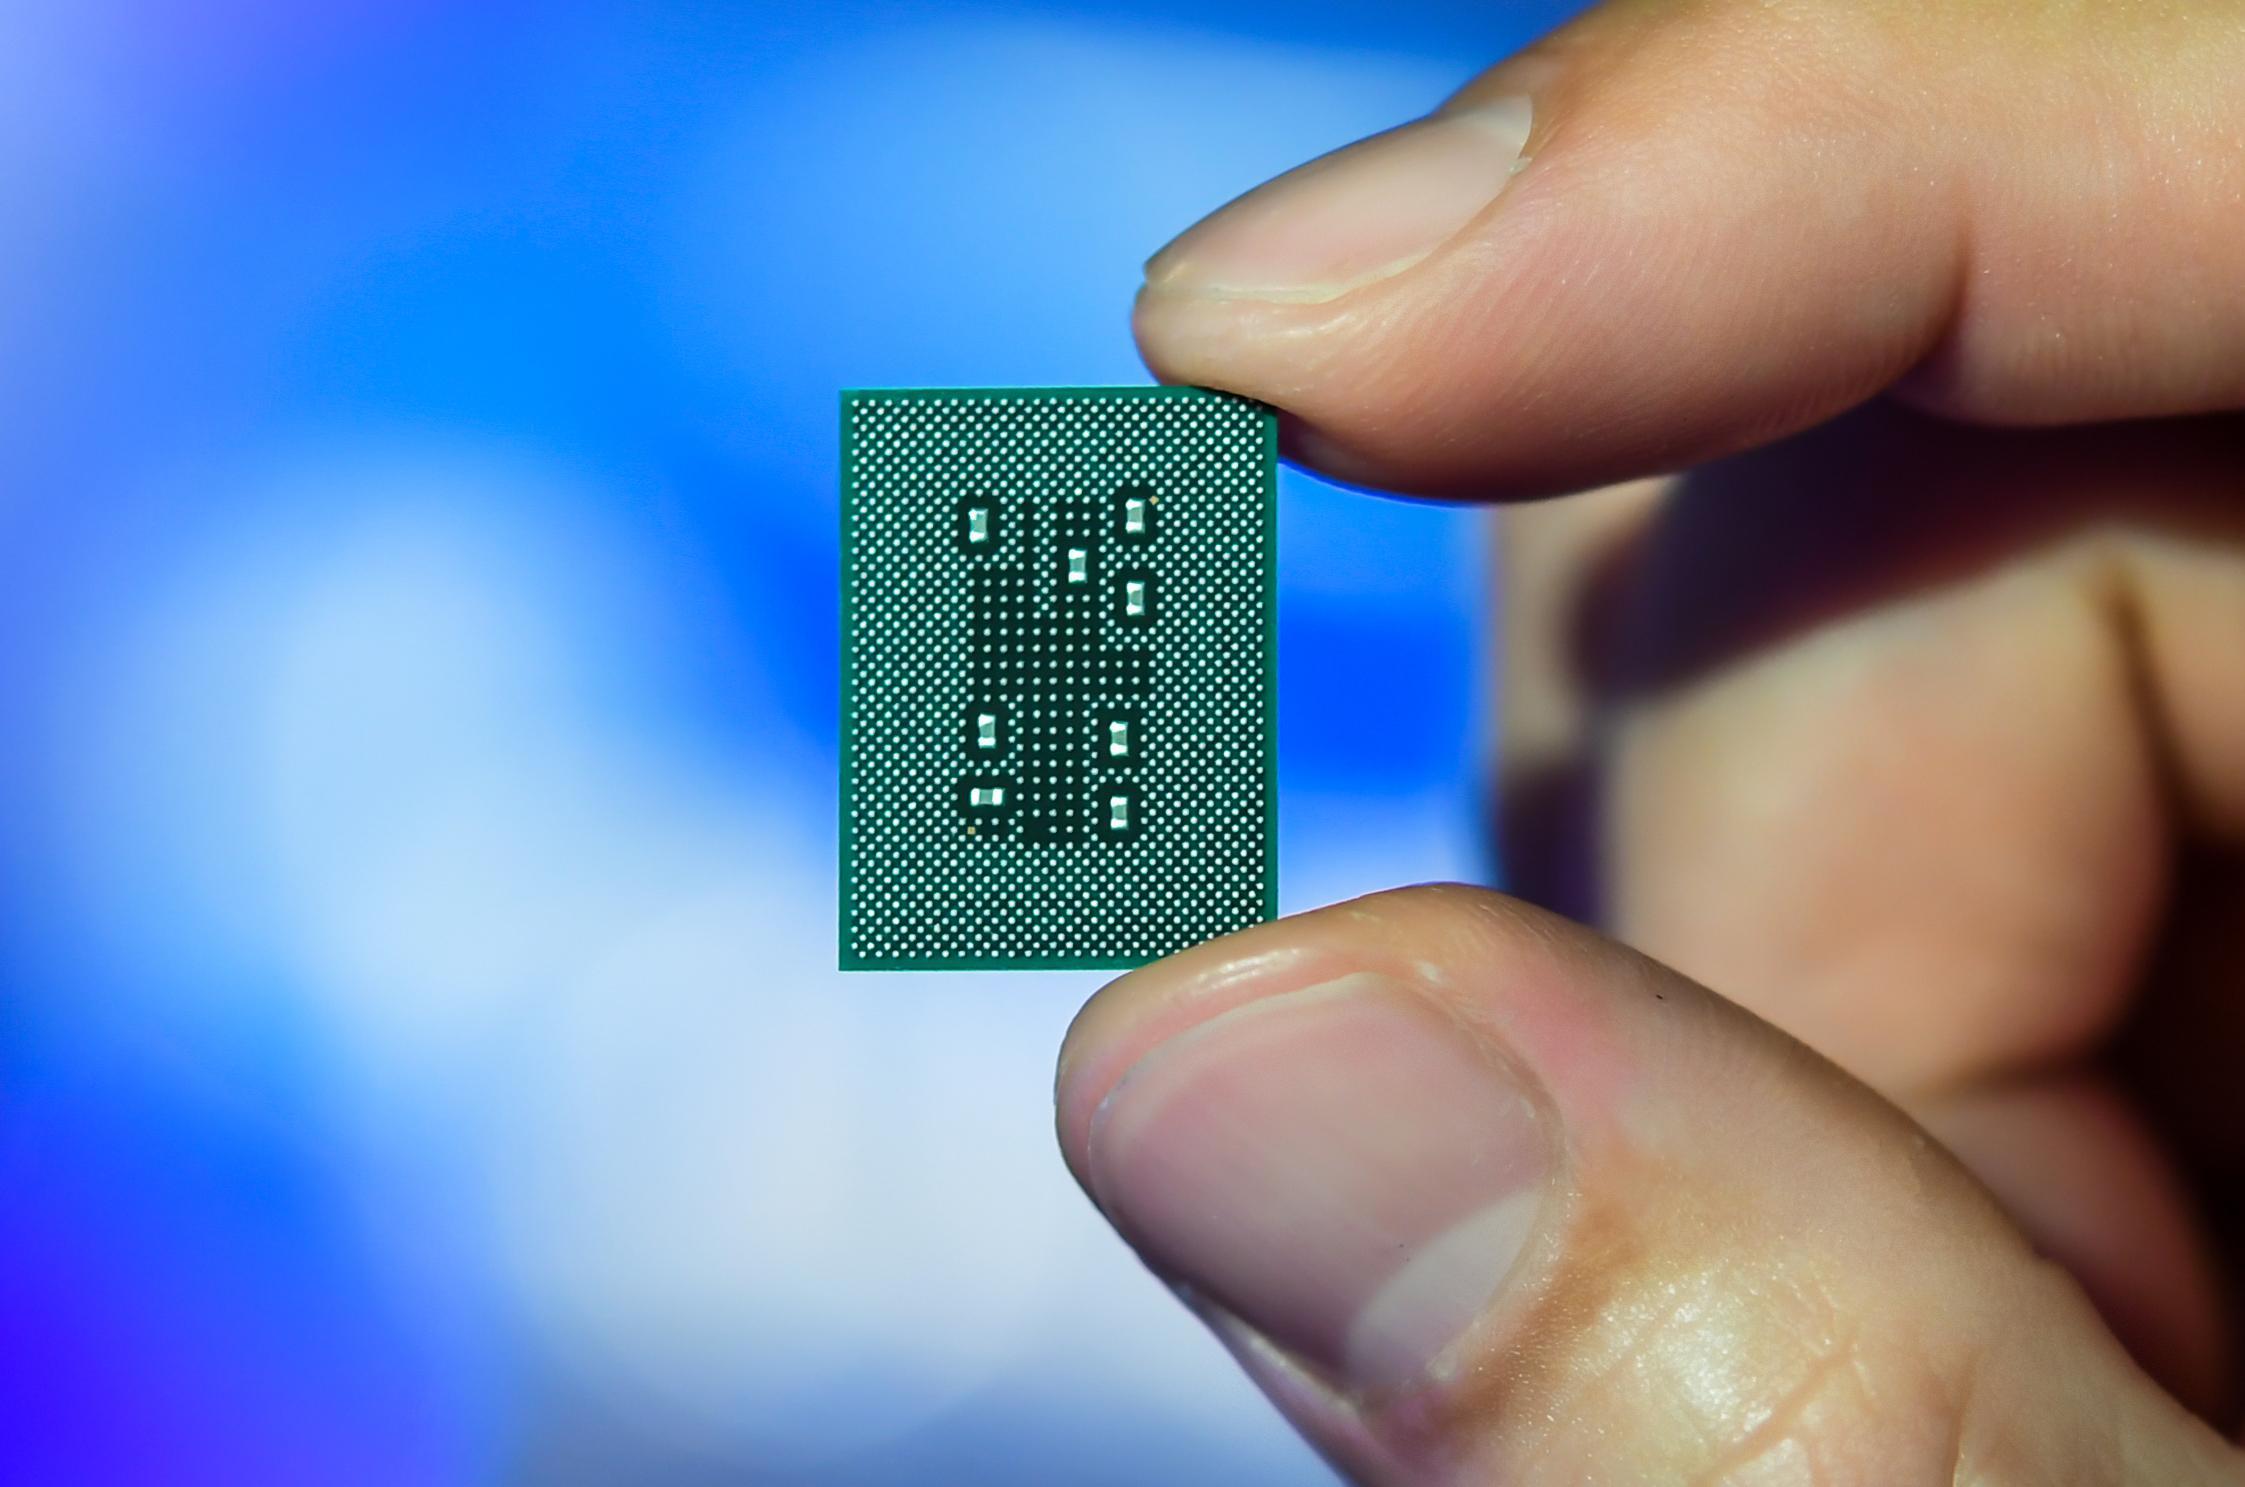 procesor Qualcomm Snapdragon 8c